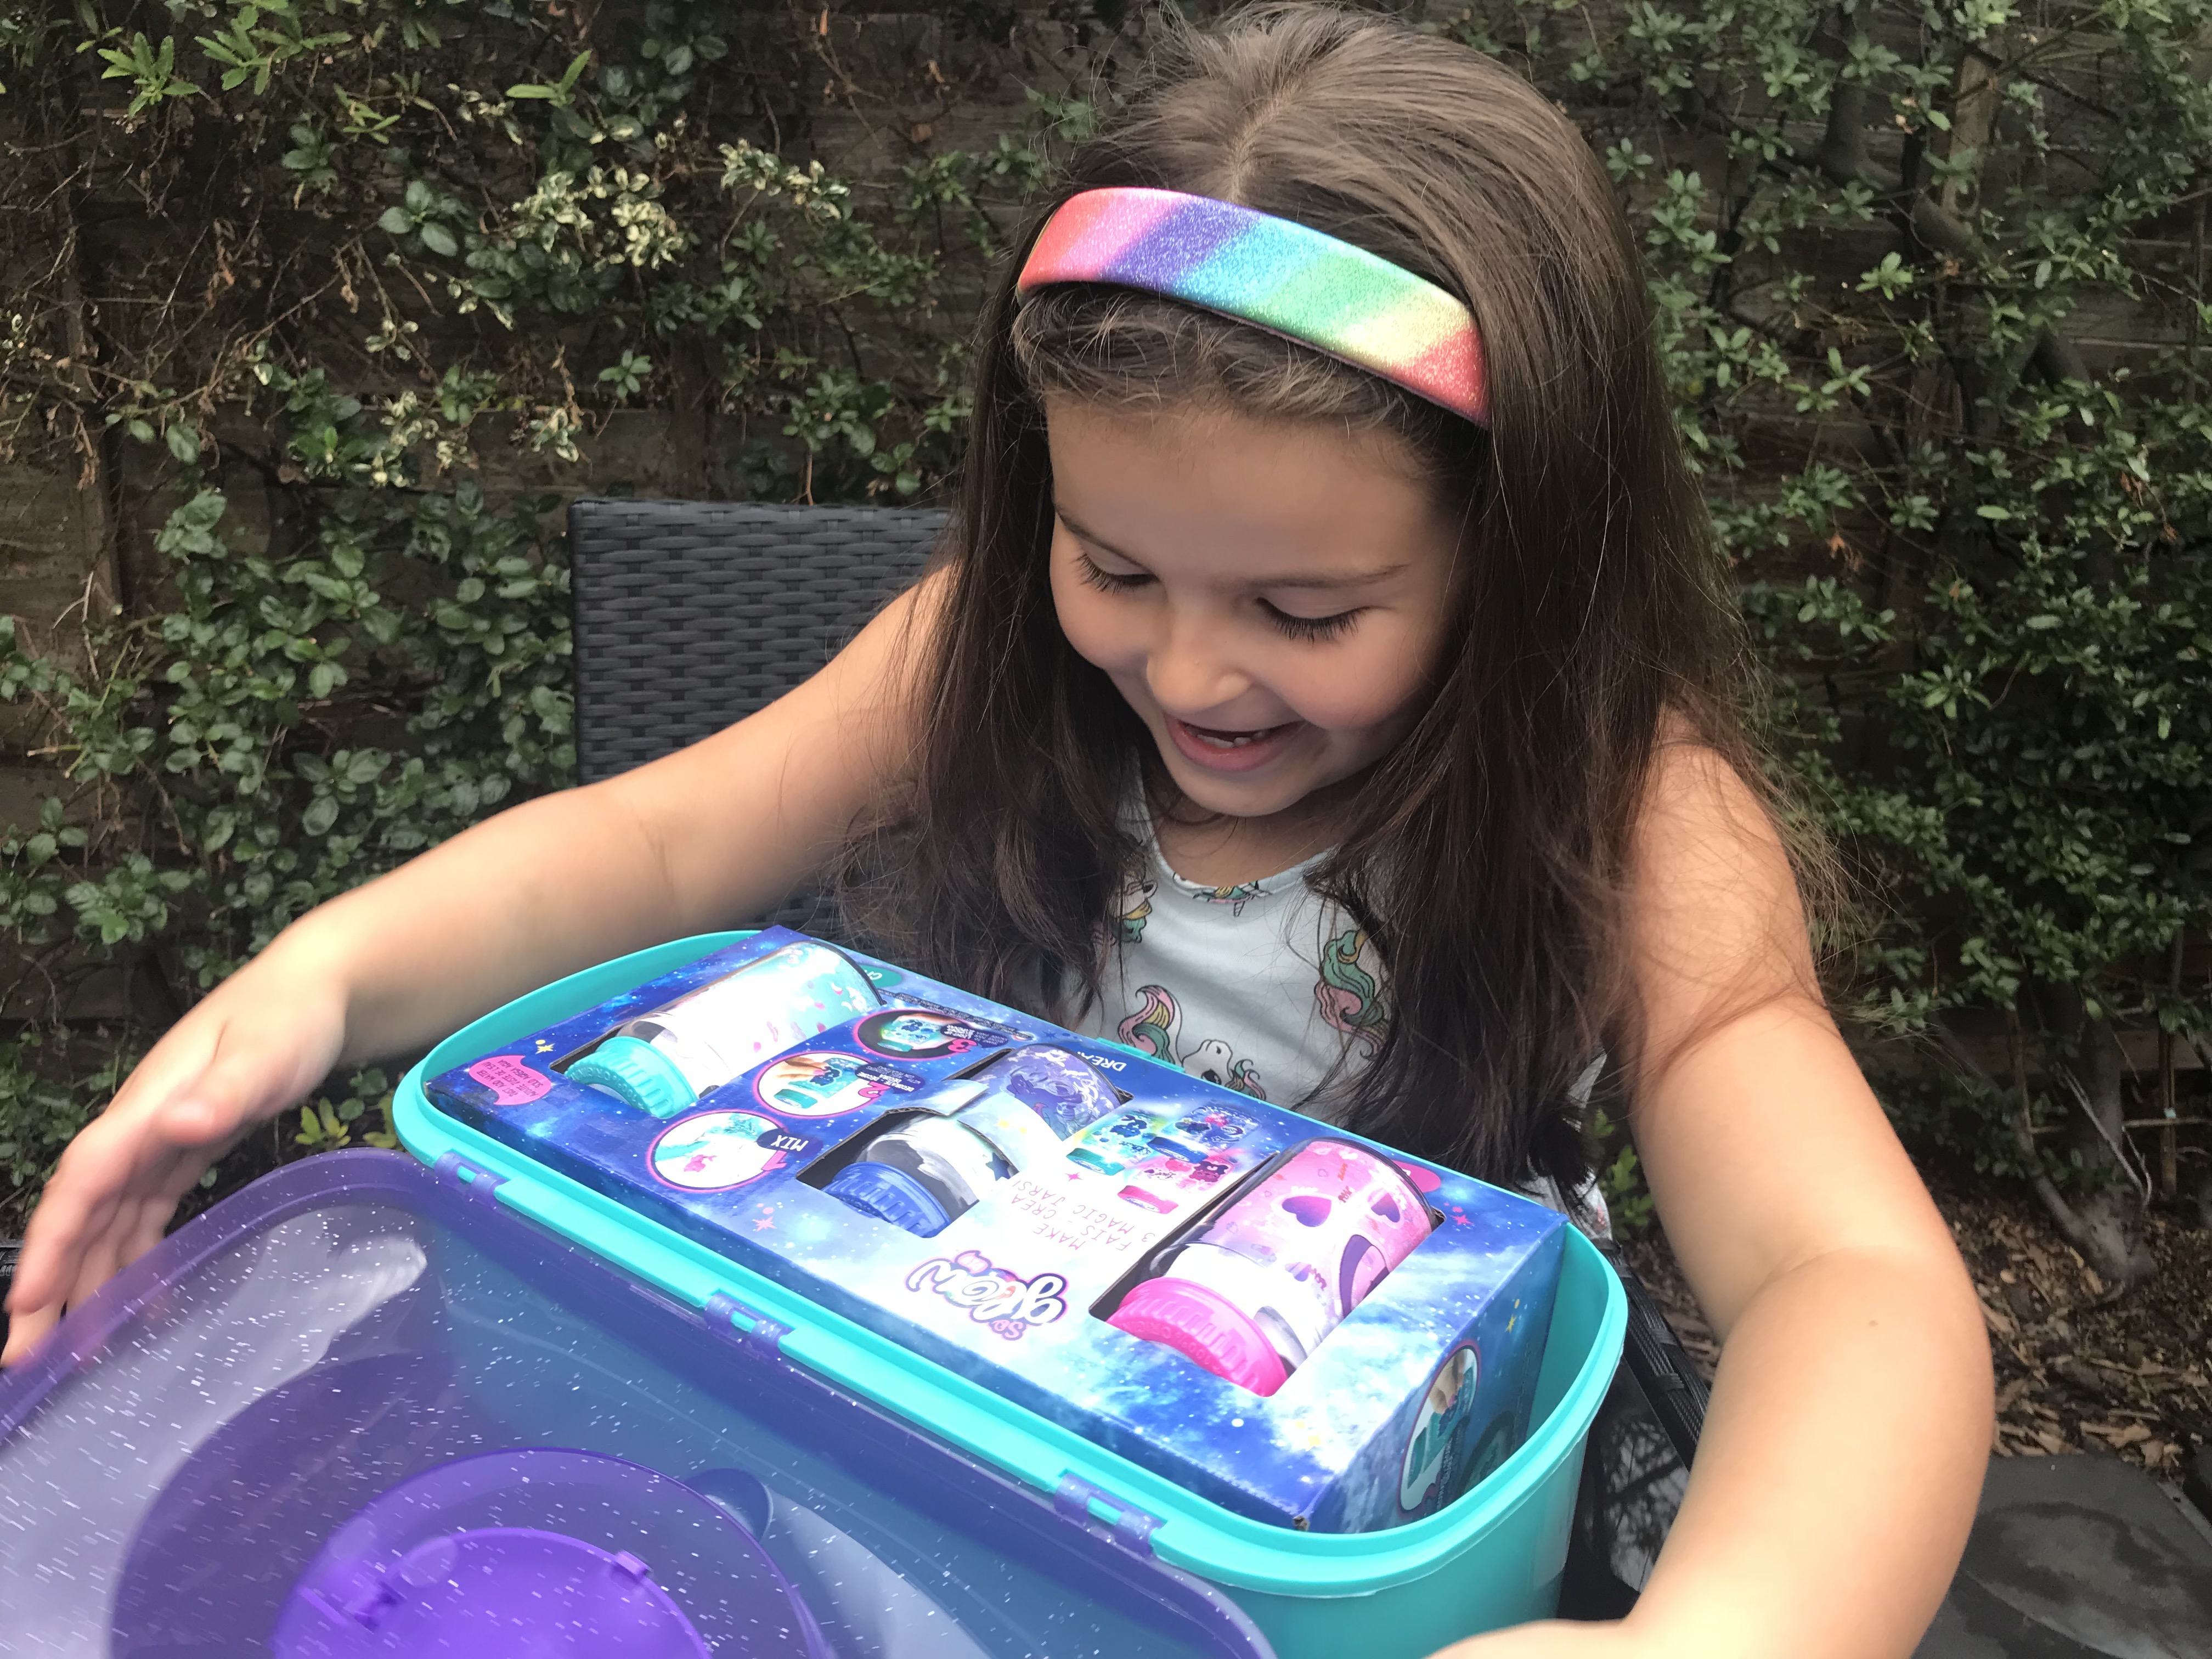 Magic Glow case and child